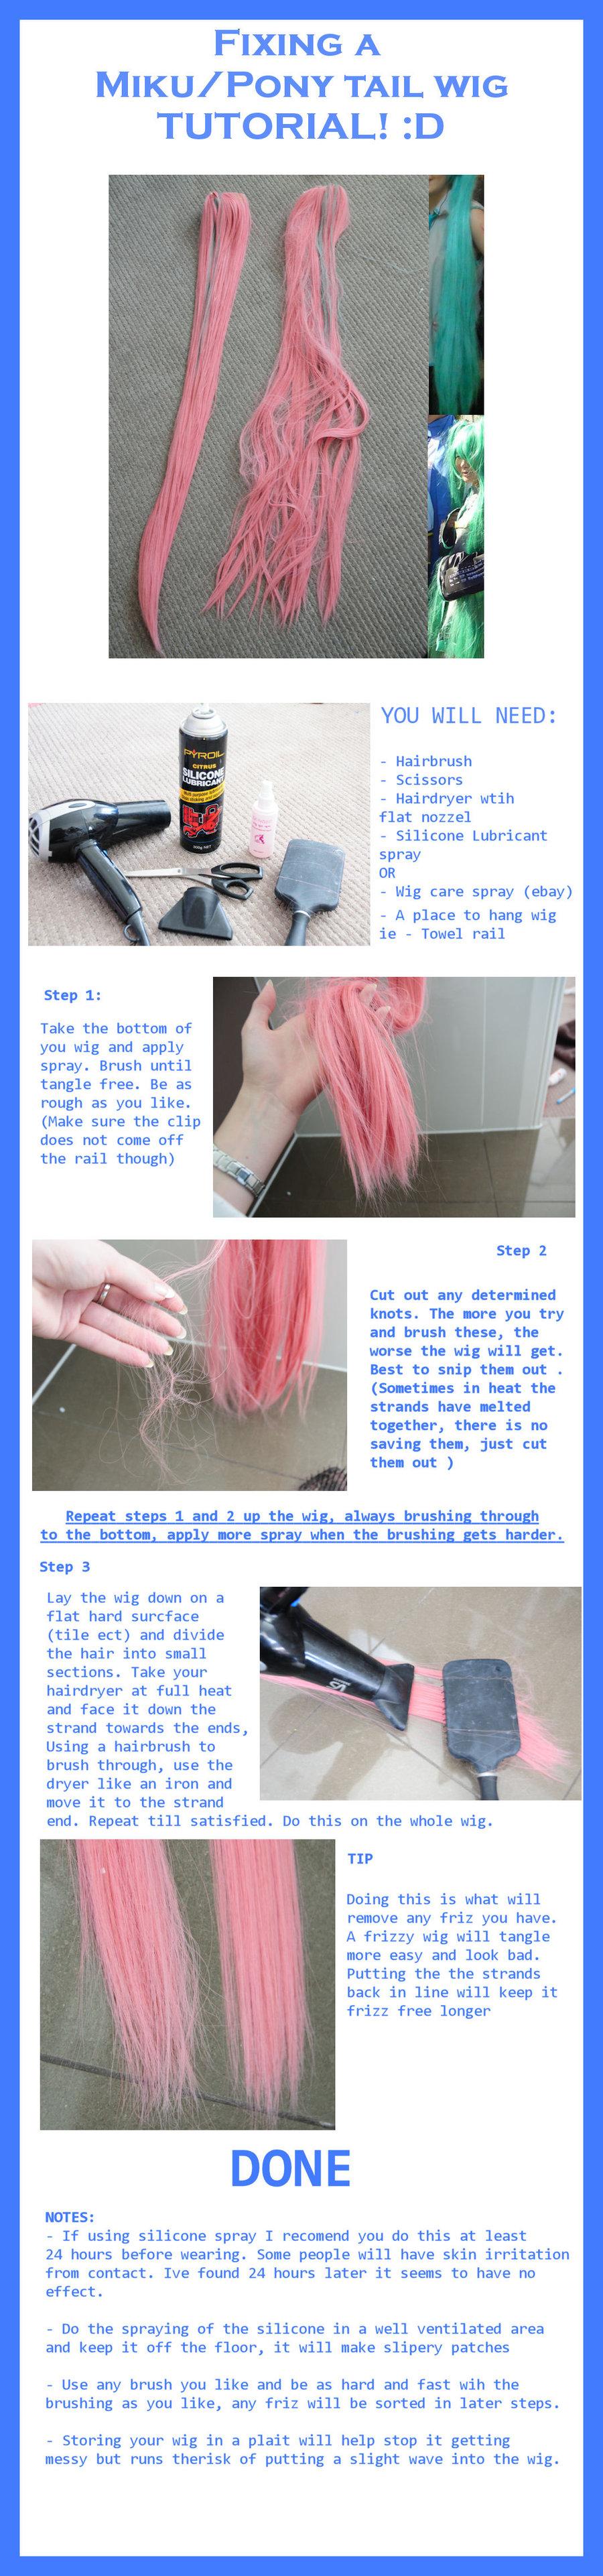 How to fix a Miku wig